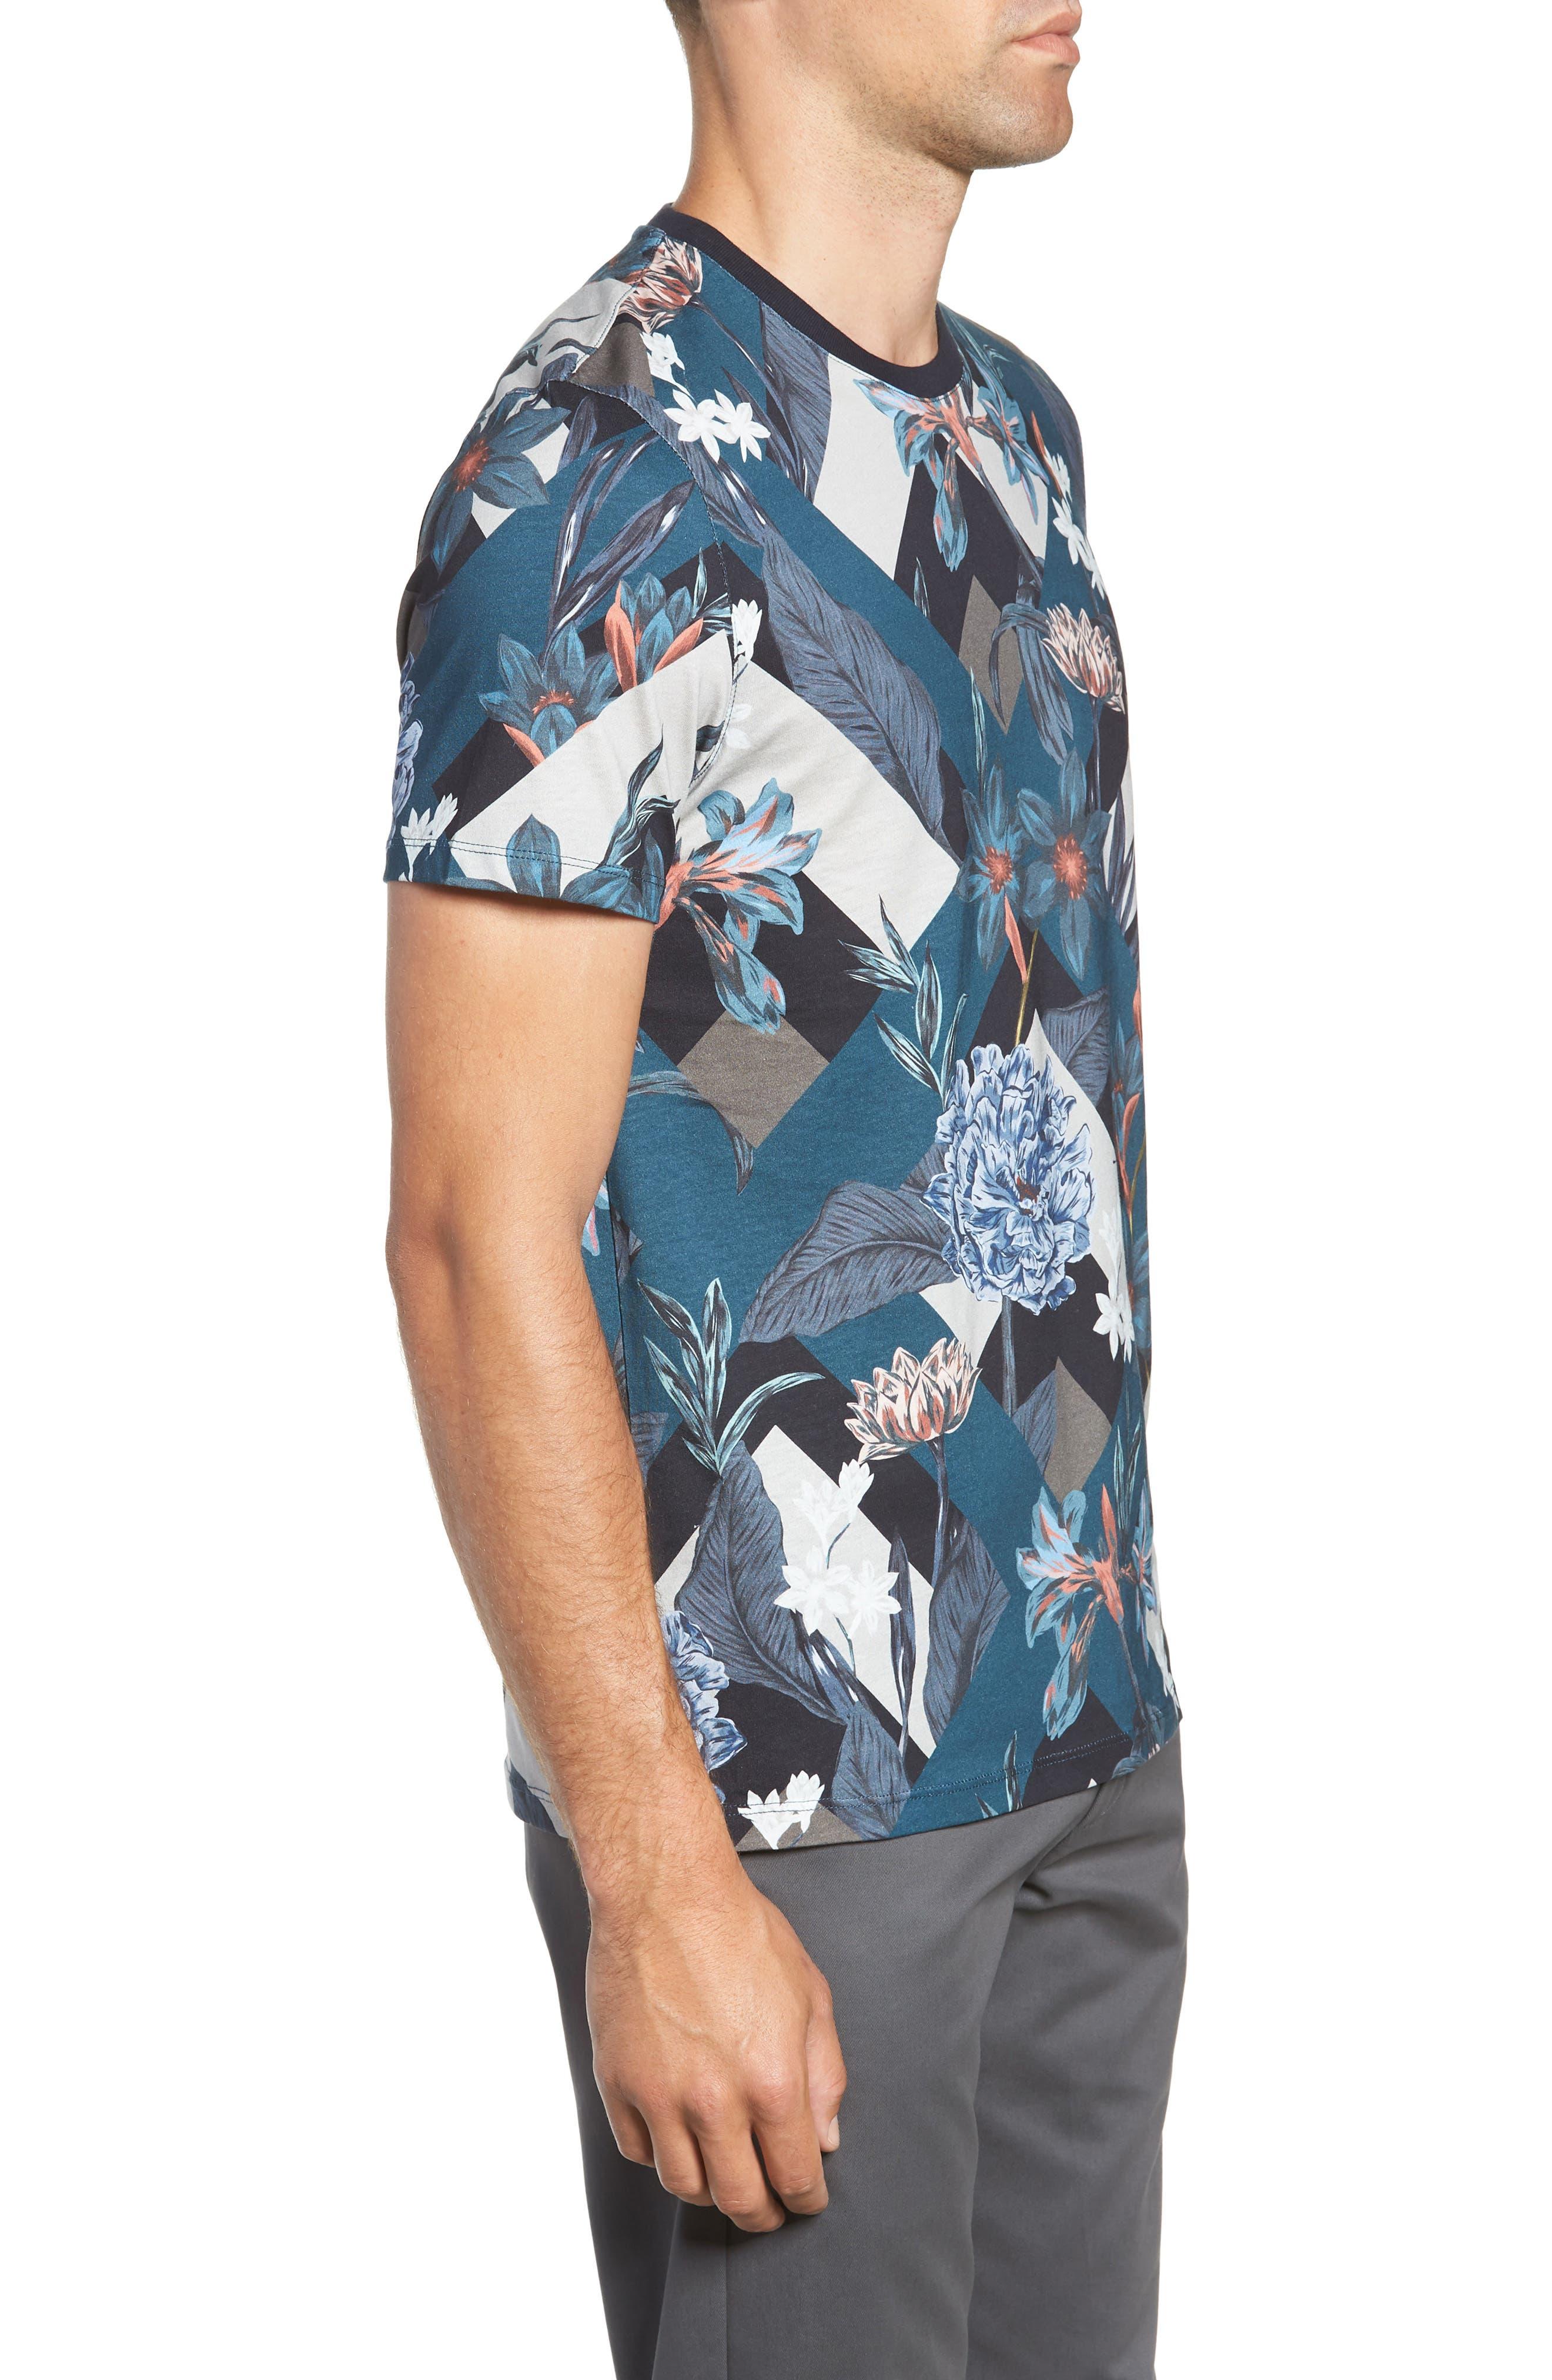 Jolly Slim Fit T-Shirt,                             Alternate thumbnail 3, color,                             NAVY